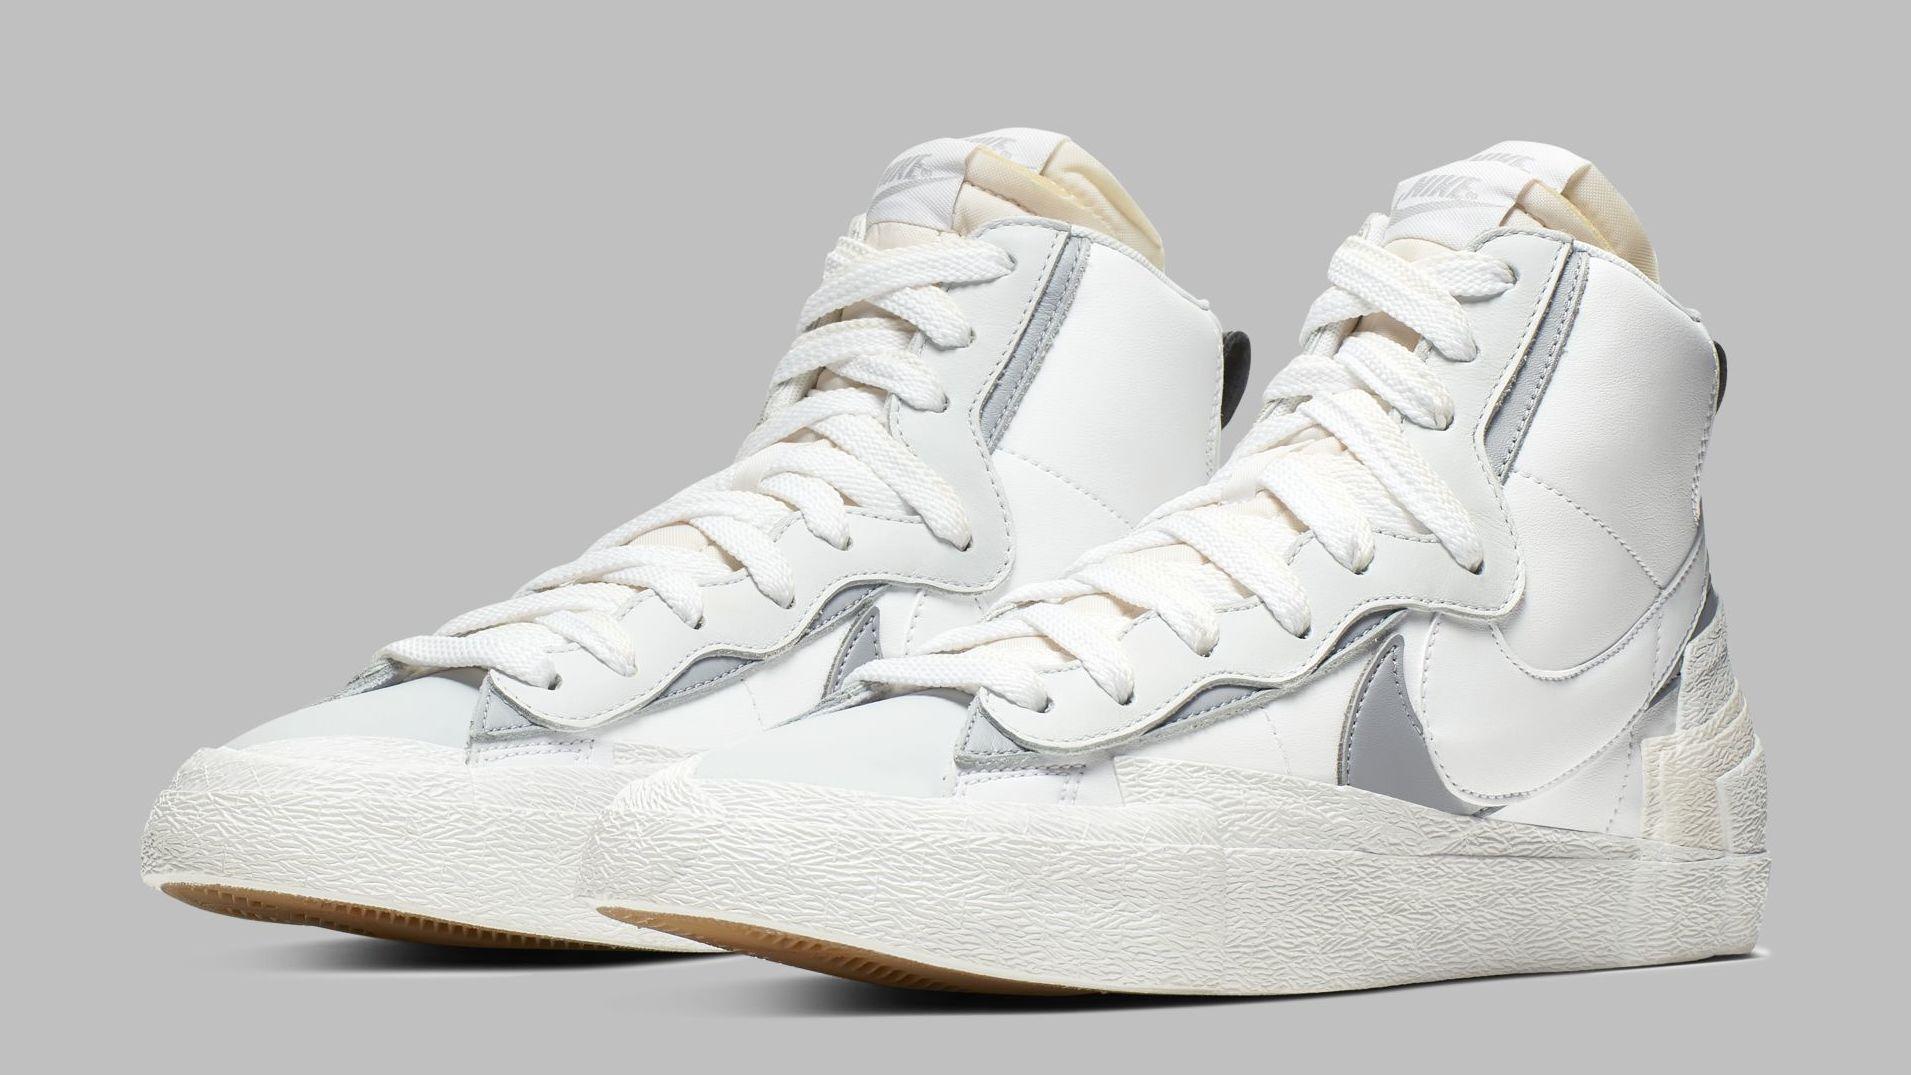 Sacai x Nike Blazer High Black White Release Date BV0072-100 ...